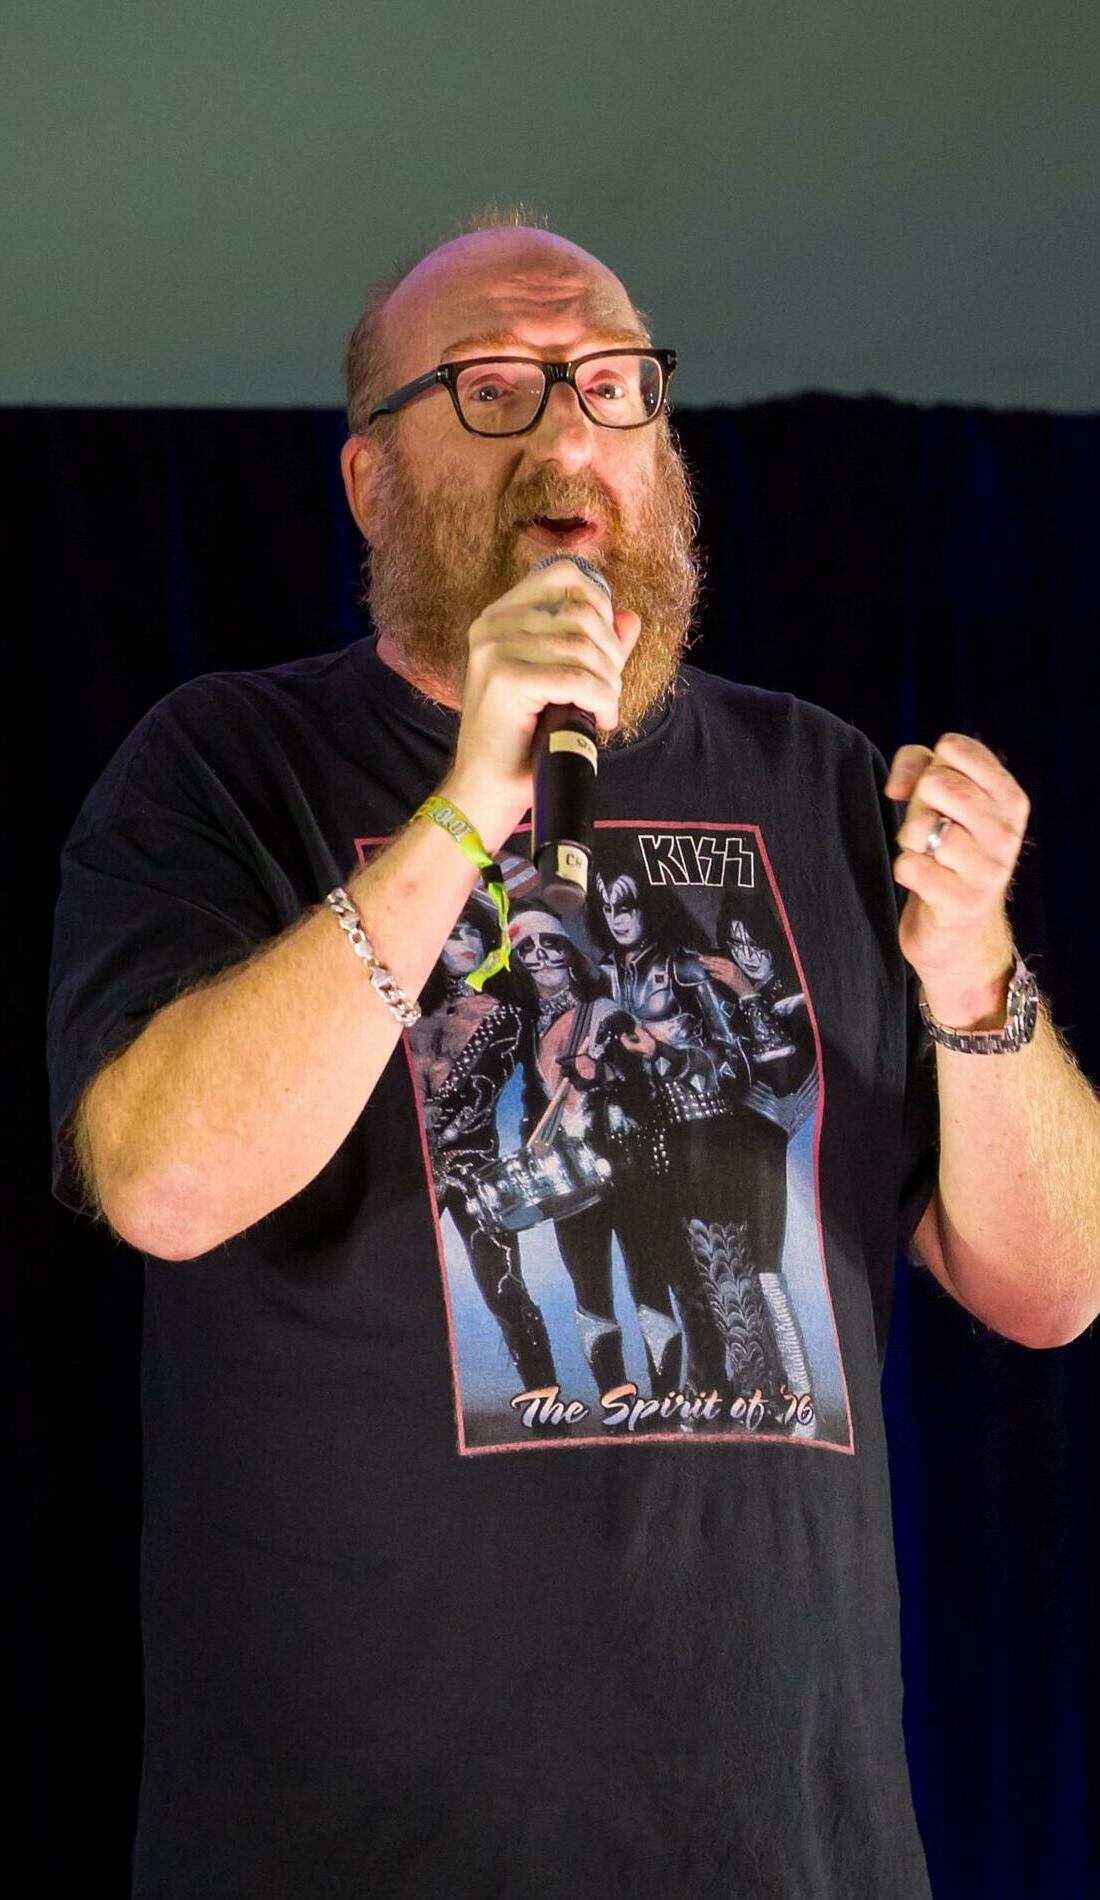 A Brian Posehn live event